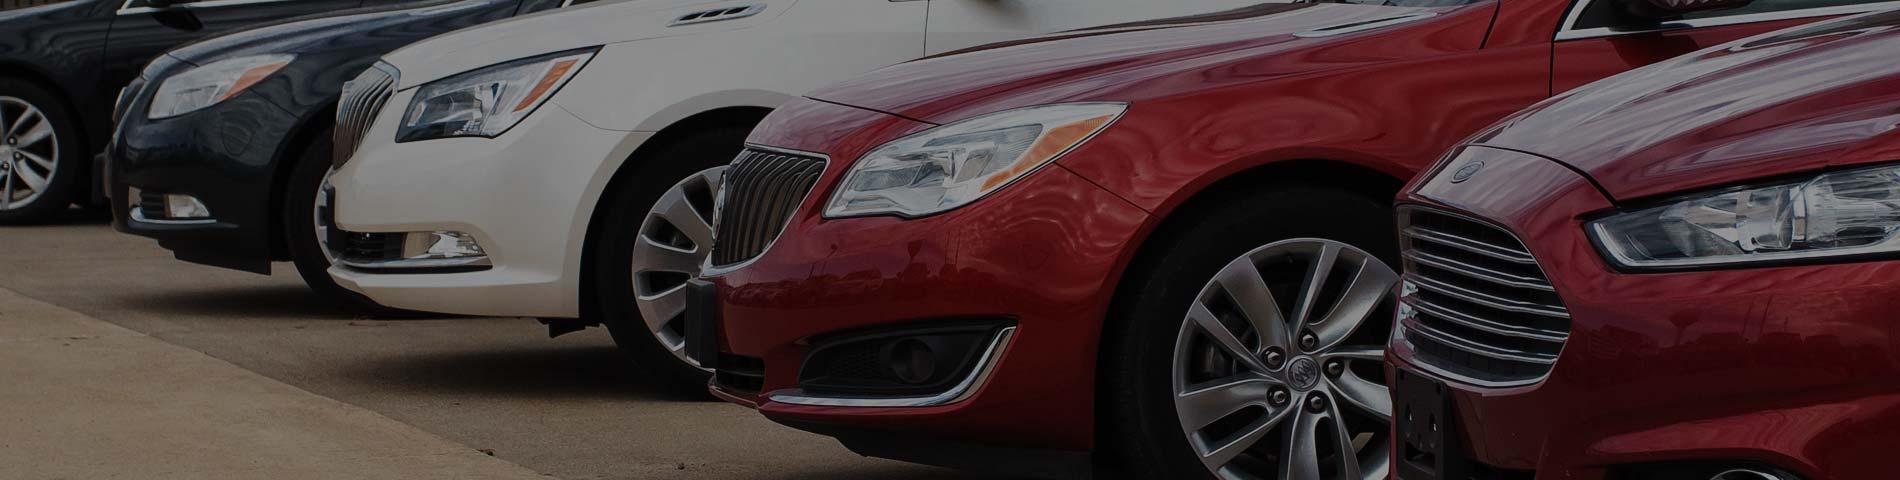 CarShopper.com Automall